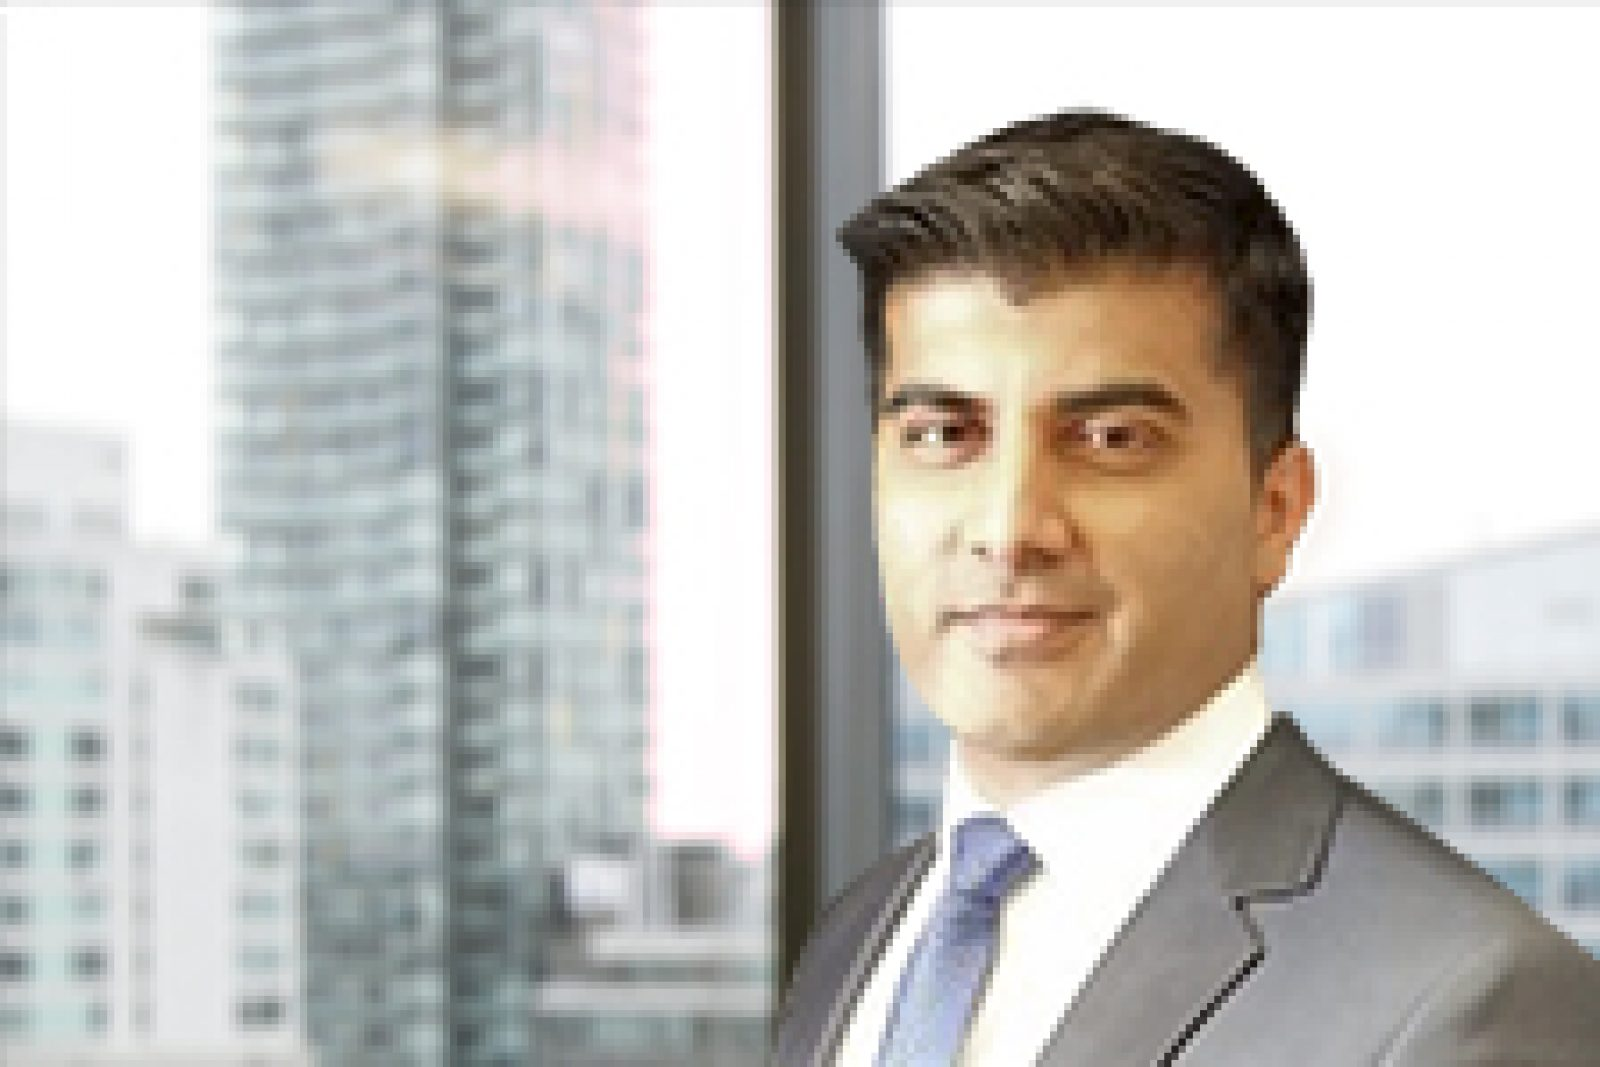 Cyber Security Instructor Ali Khan